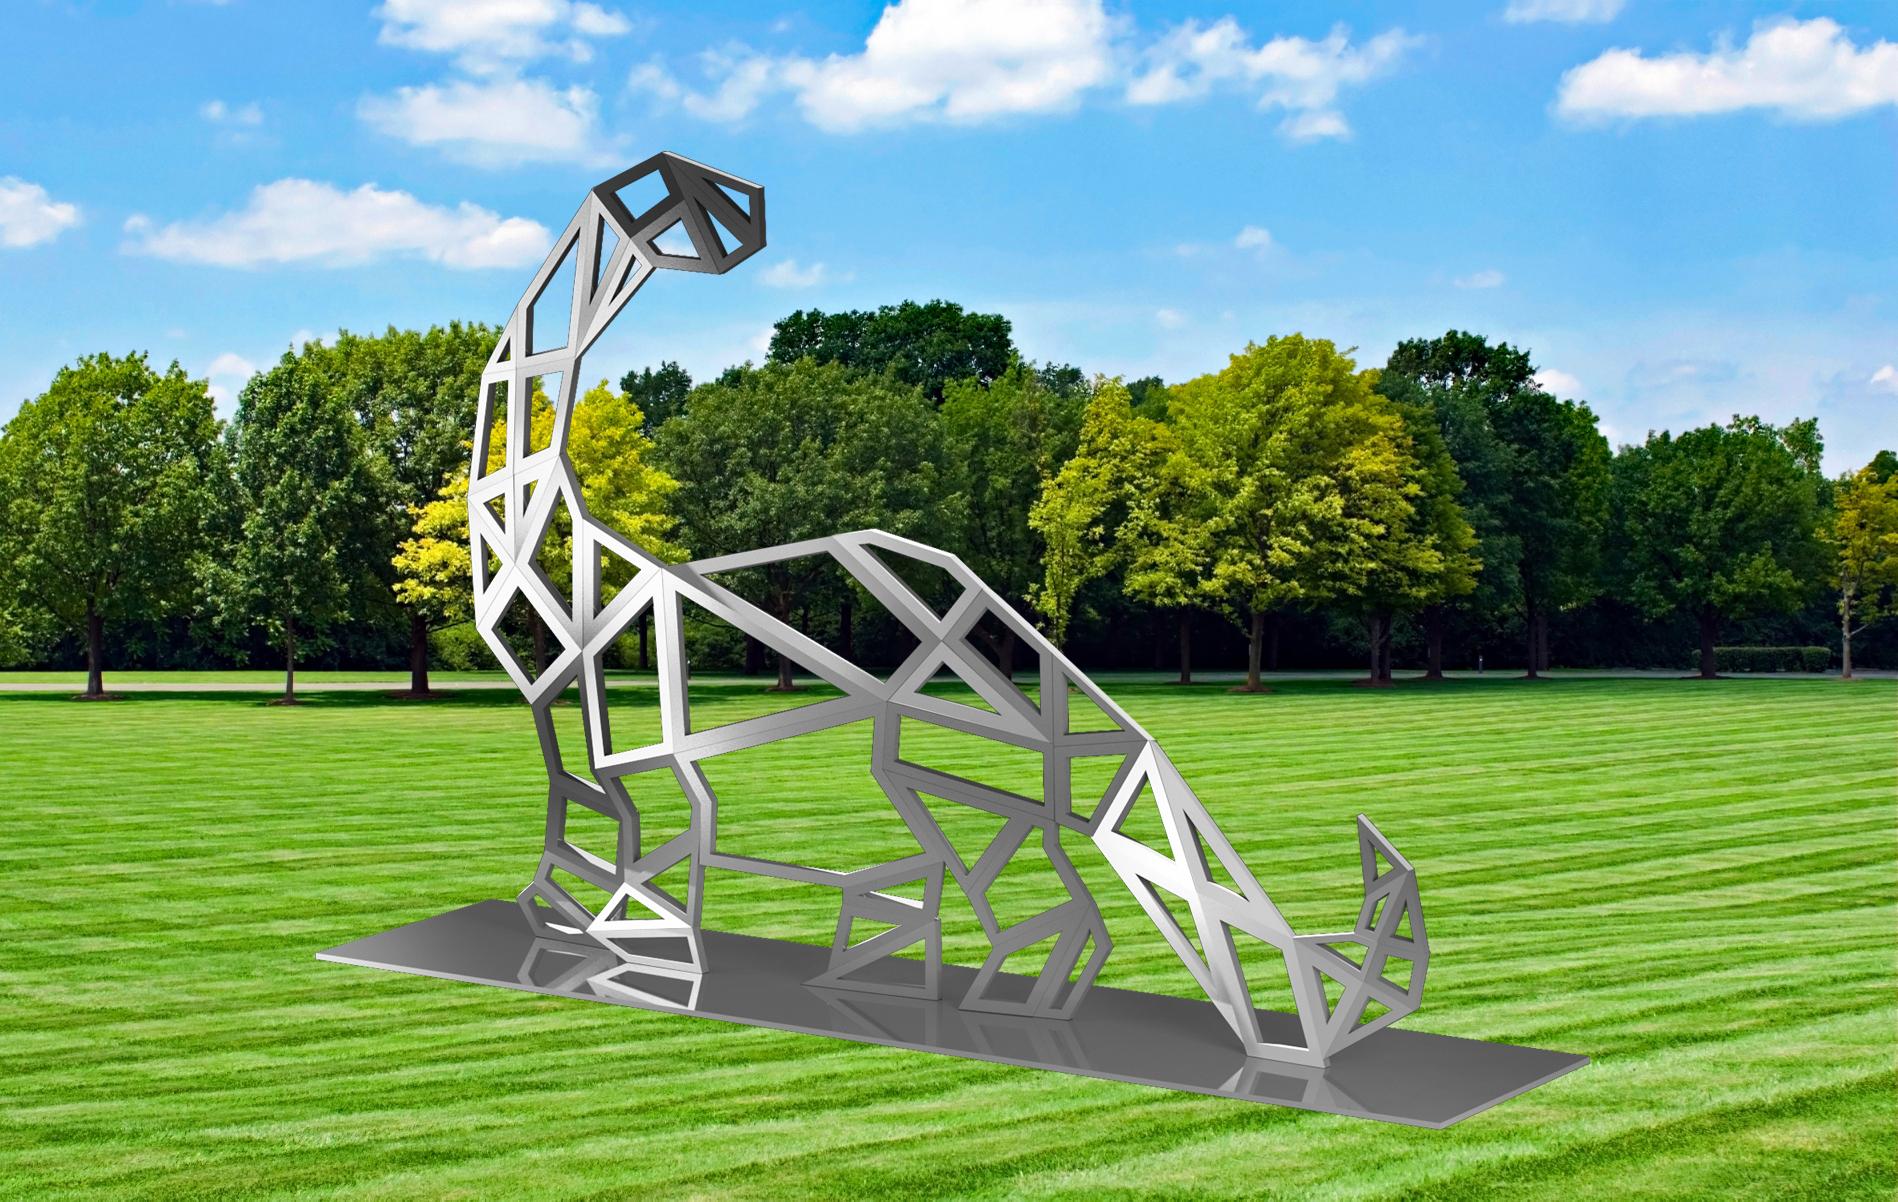 10 Tall Modern Brontosaurus Dinosaur Sculpture Huge Outdoor